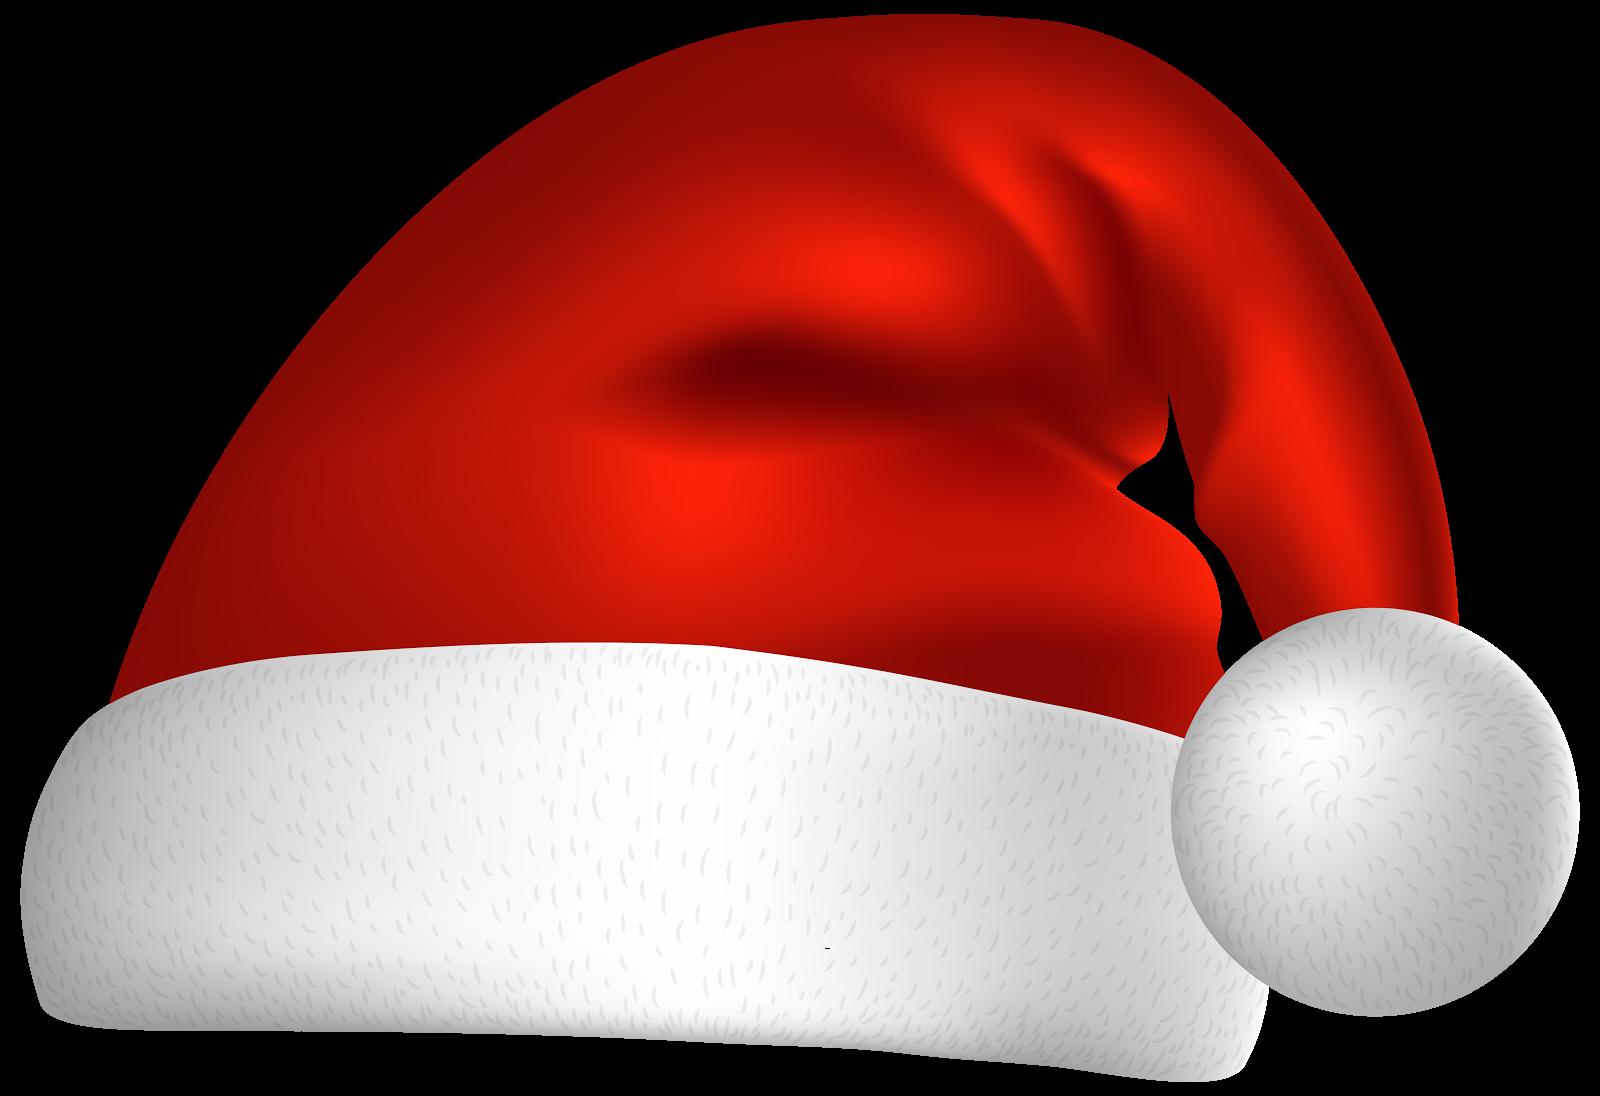 Touca papai noel clipart banner stock Chapéus de Papai Noel | IMAGENS PARA VOCÊ banner stock